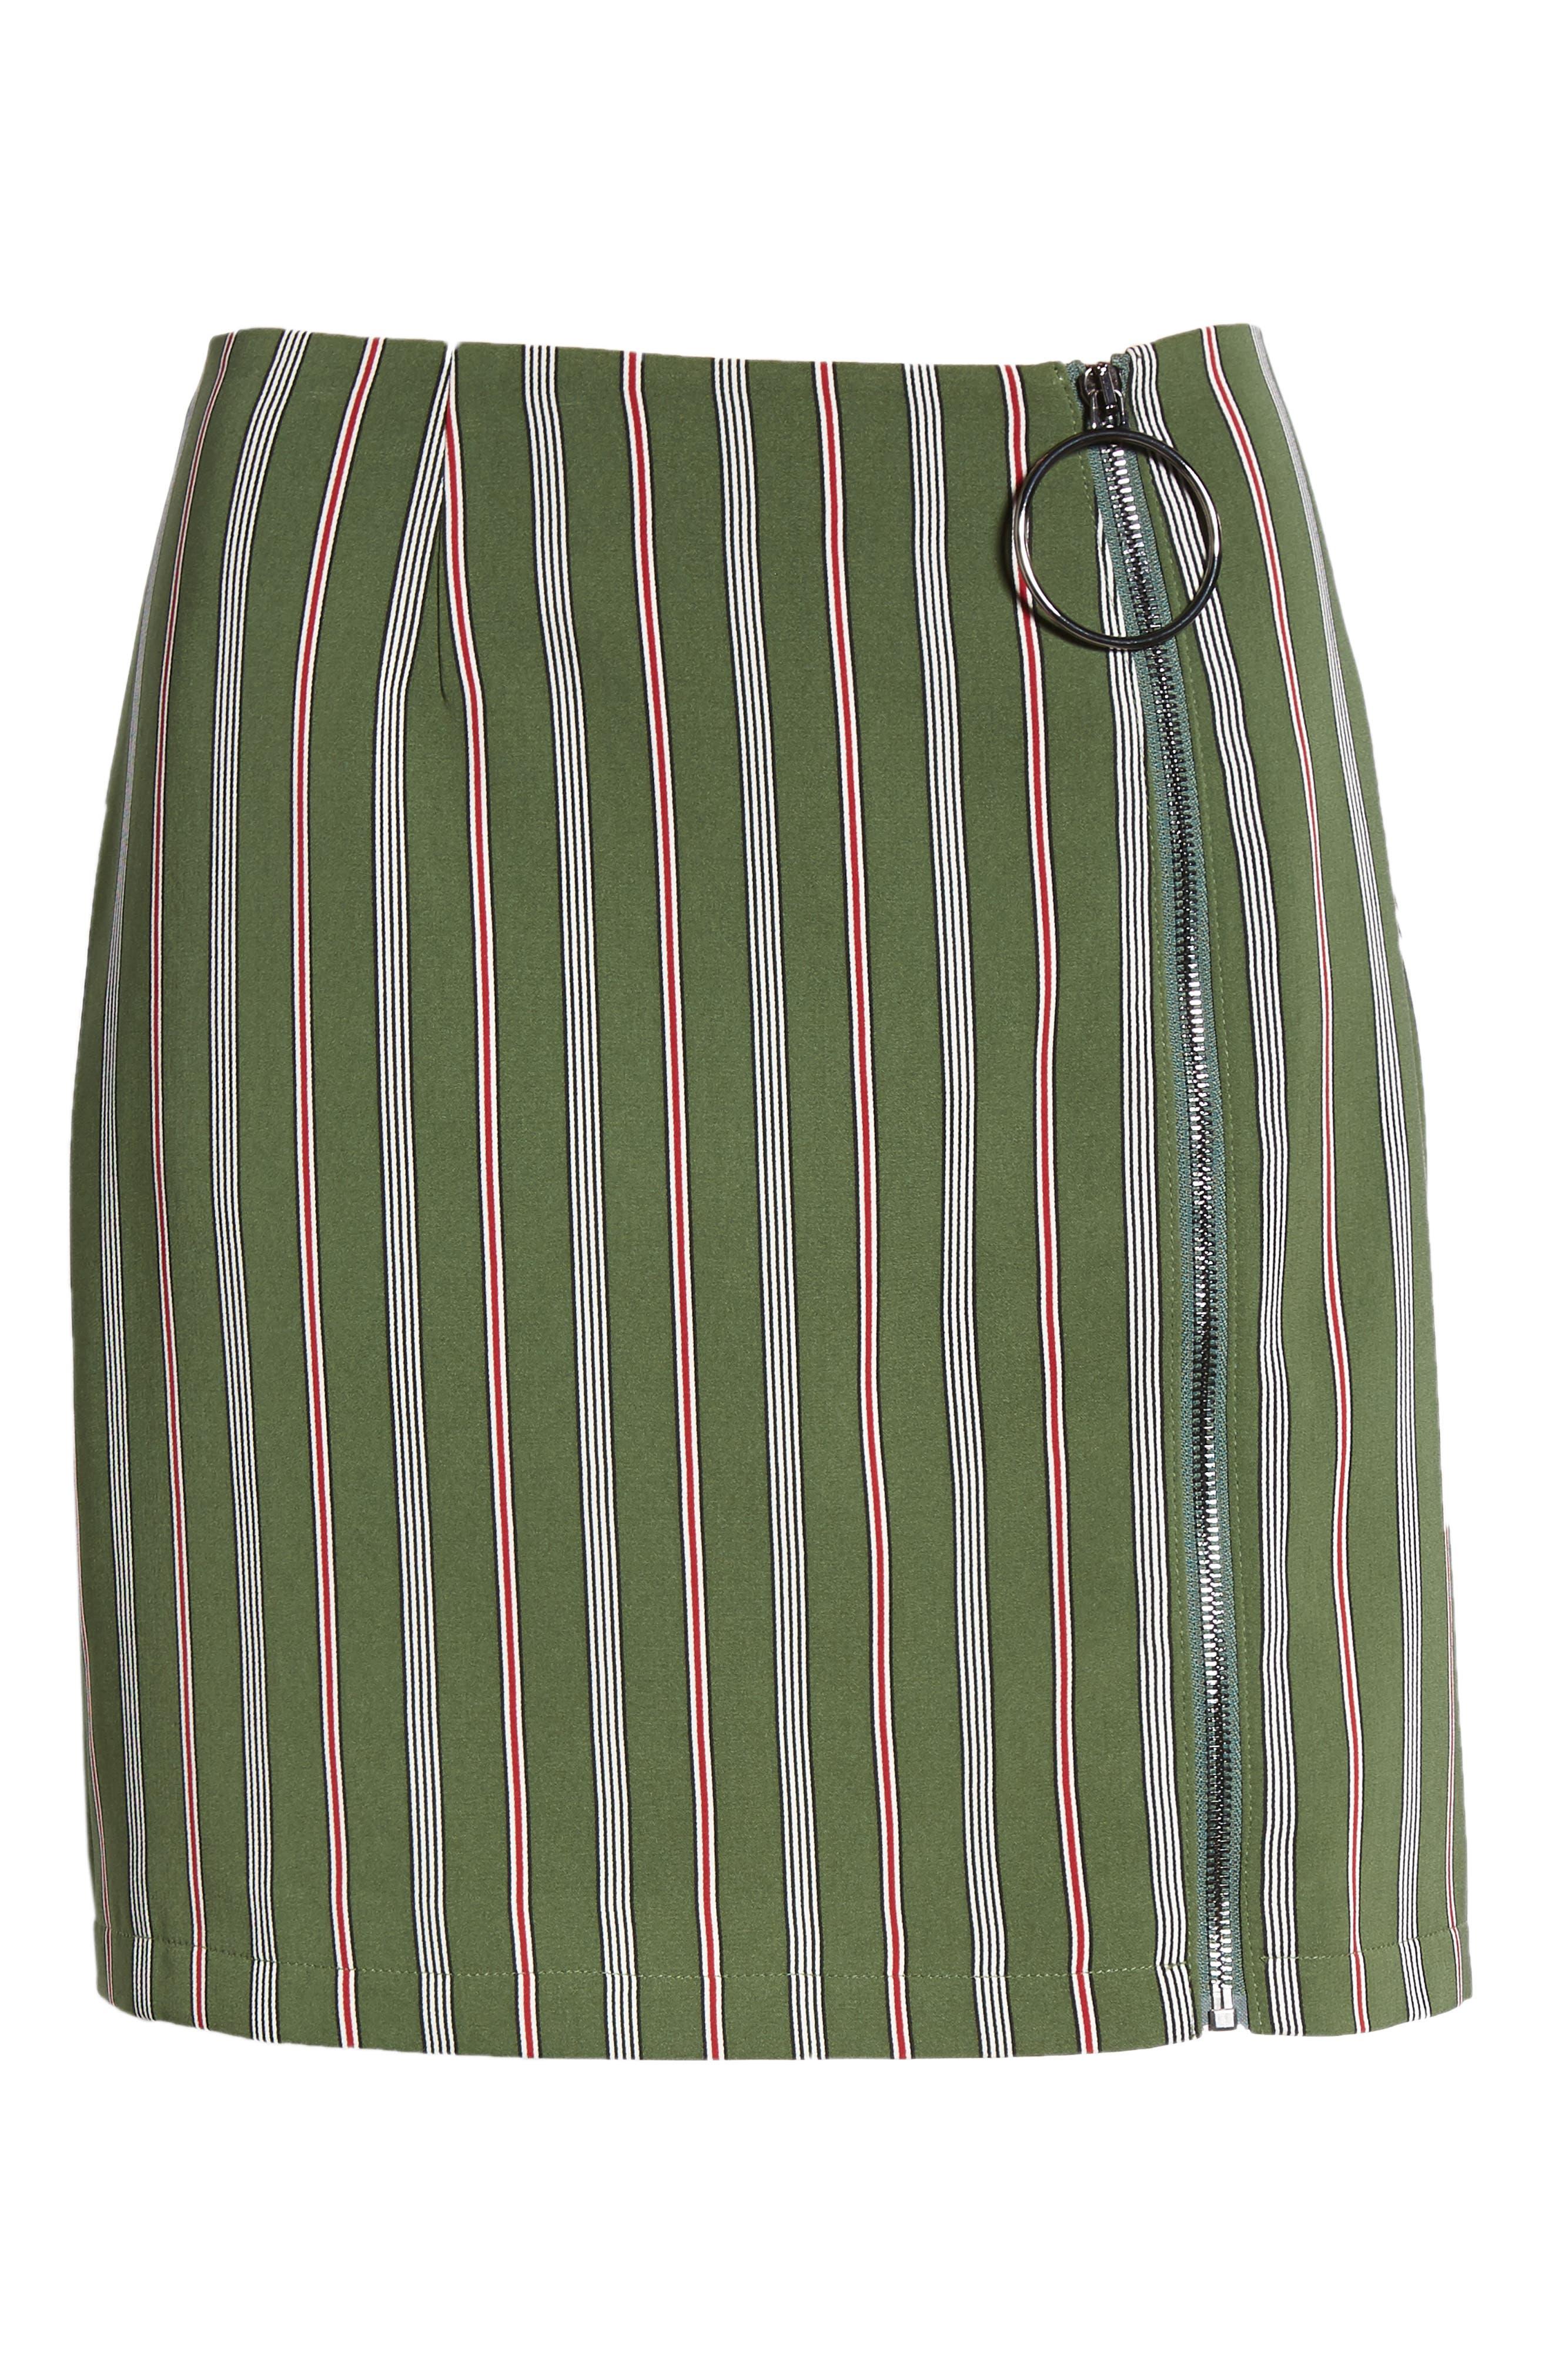 Axial Stripe Miniskirt,                             Alternate thumbnail 6, color,                             300